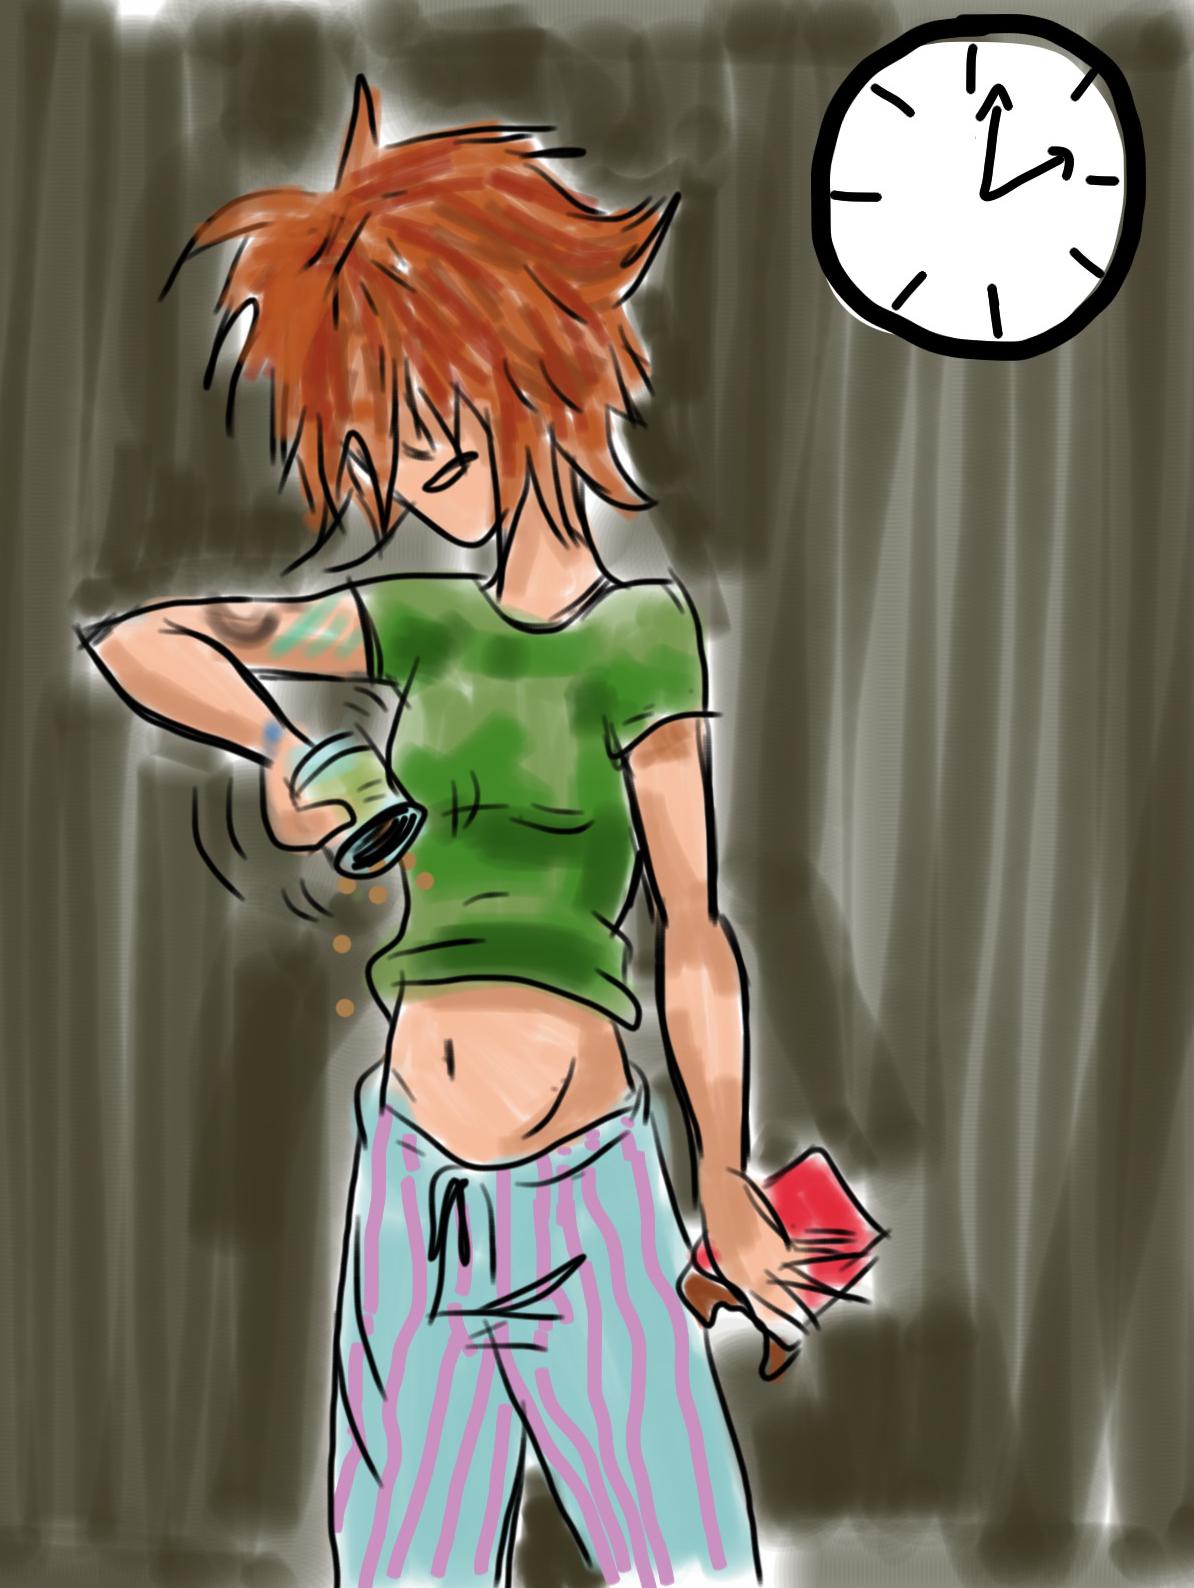 Drawing of girl shaking jar. GIRL, CRAFTED blog.